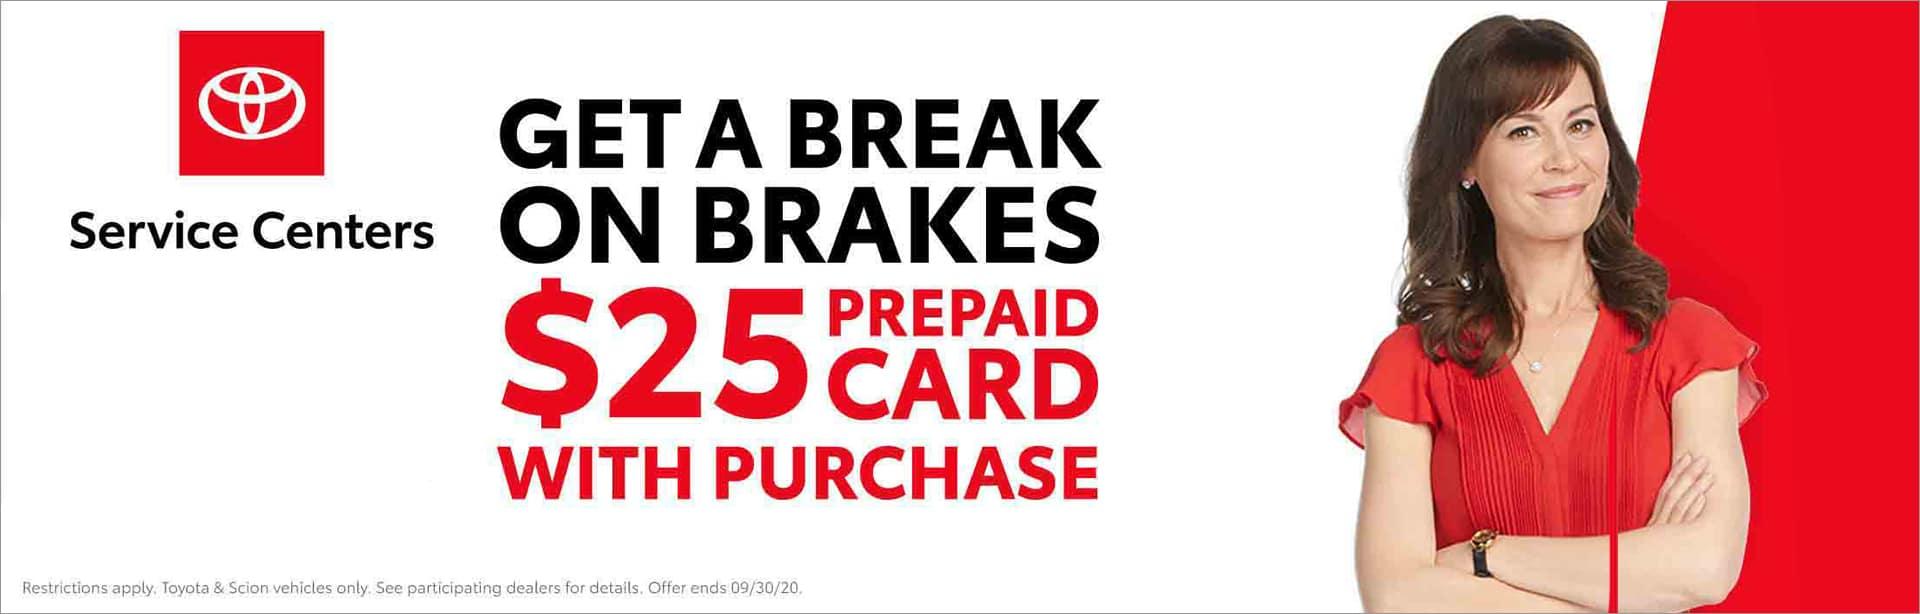 2020-09 National $25 Brake Rebate